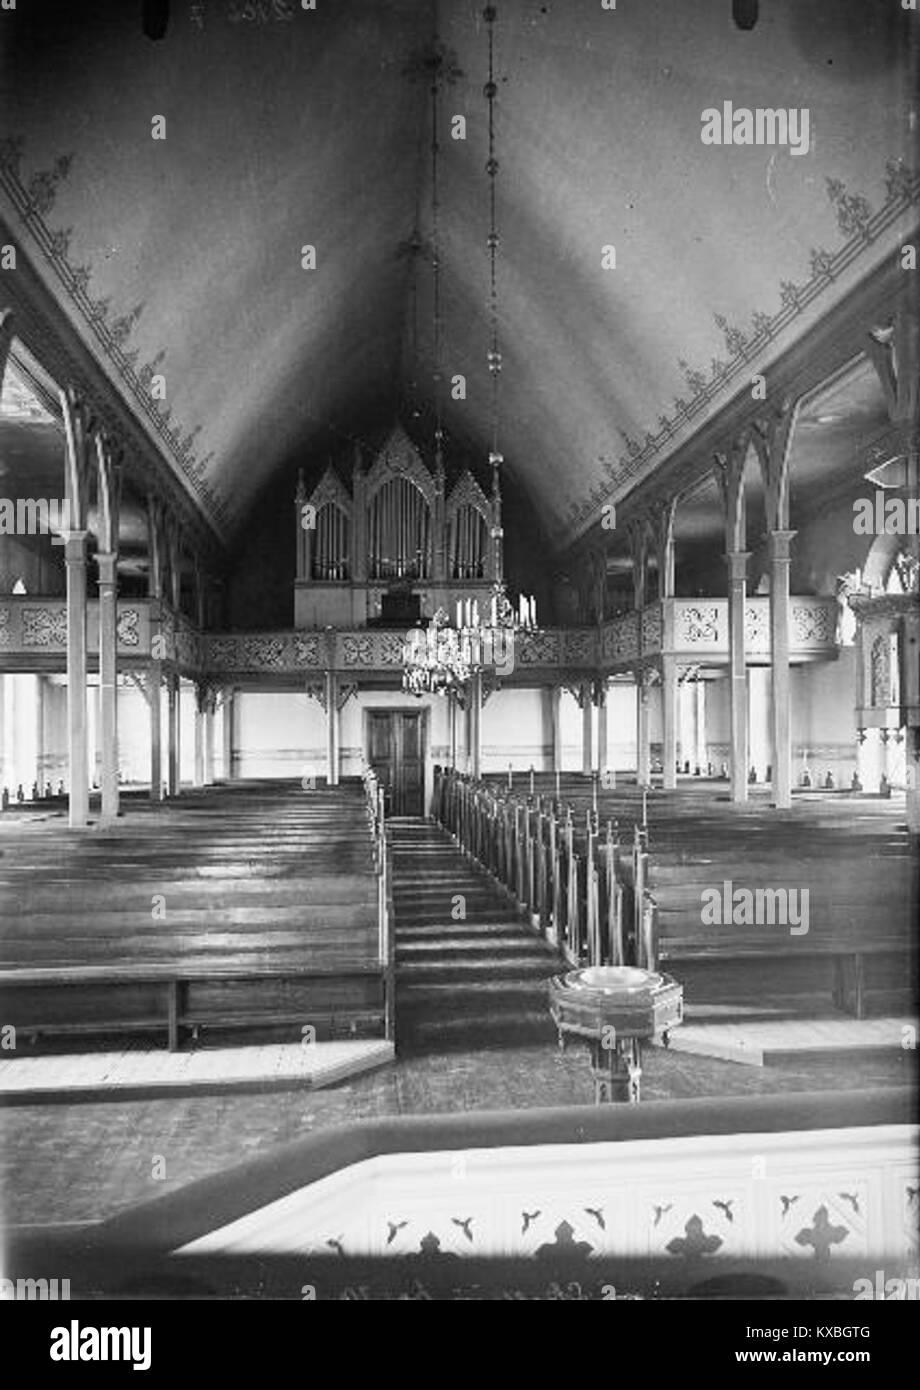 File:Skallsj kyrka - KMB - redteksystems.net - Wikimedia